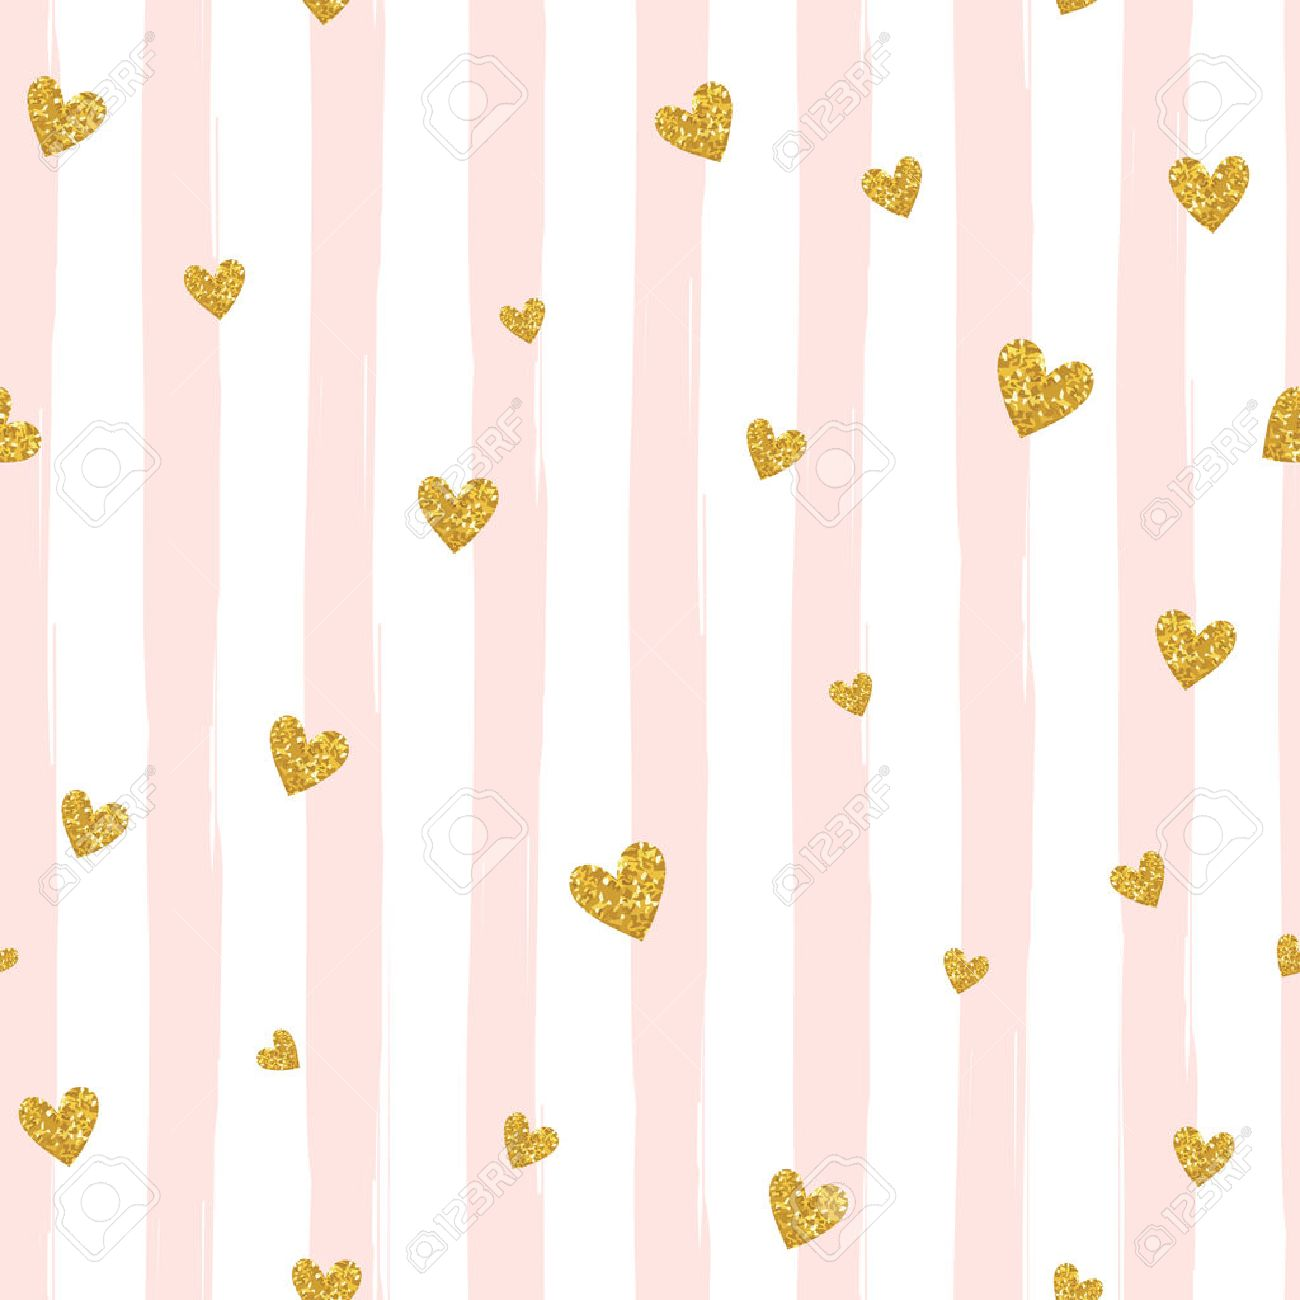 Confetti background vector golden confetti background - Gold Glittering Heart Confetti Seamless Pattern On Striped Background Stock Vector 51837386